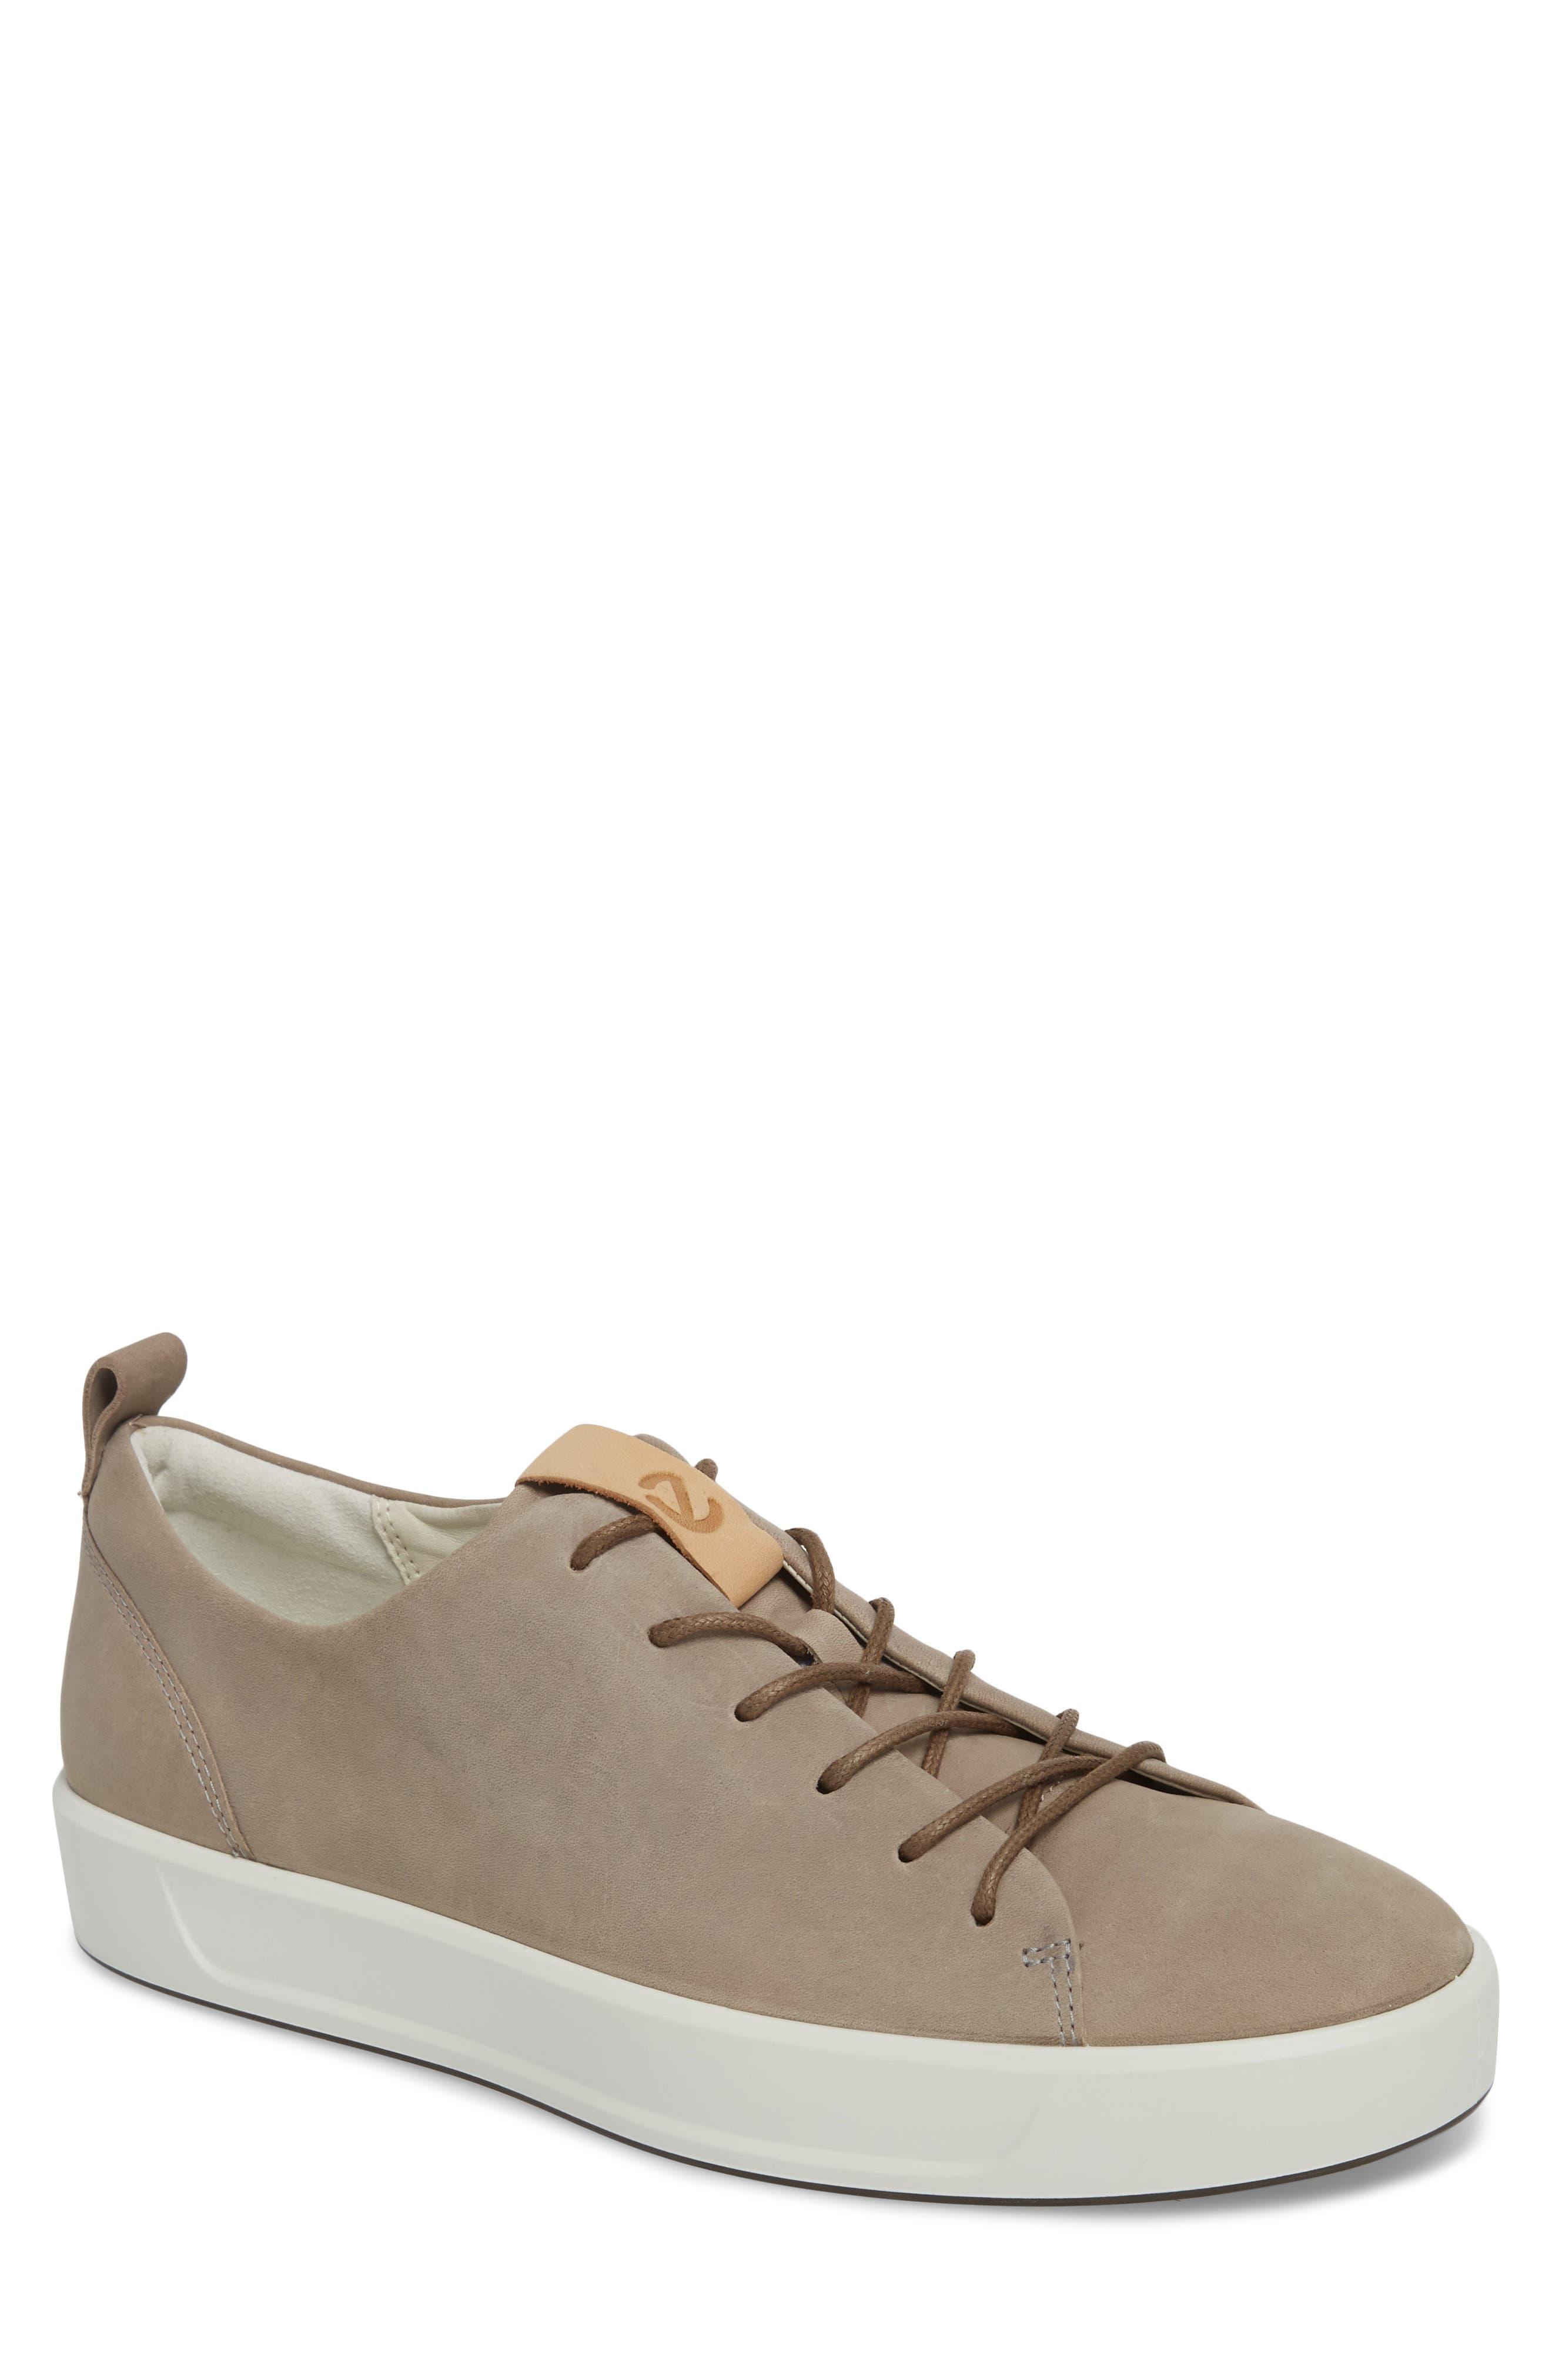 ECCO, Soft 8 Sneaker, Main thumbnail 1, color, MOONROCK